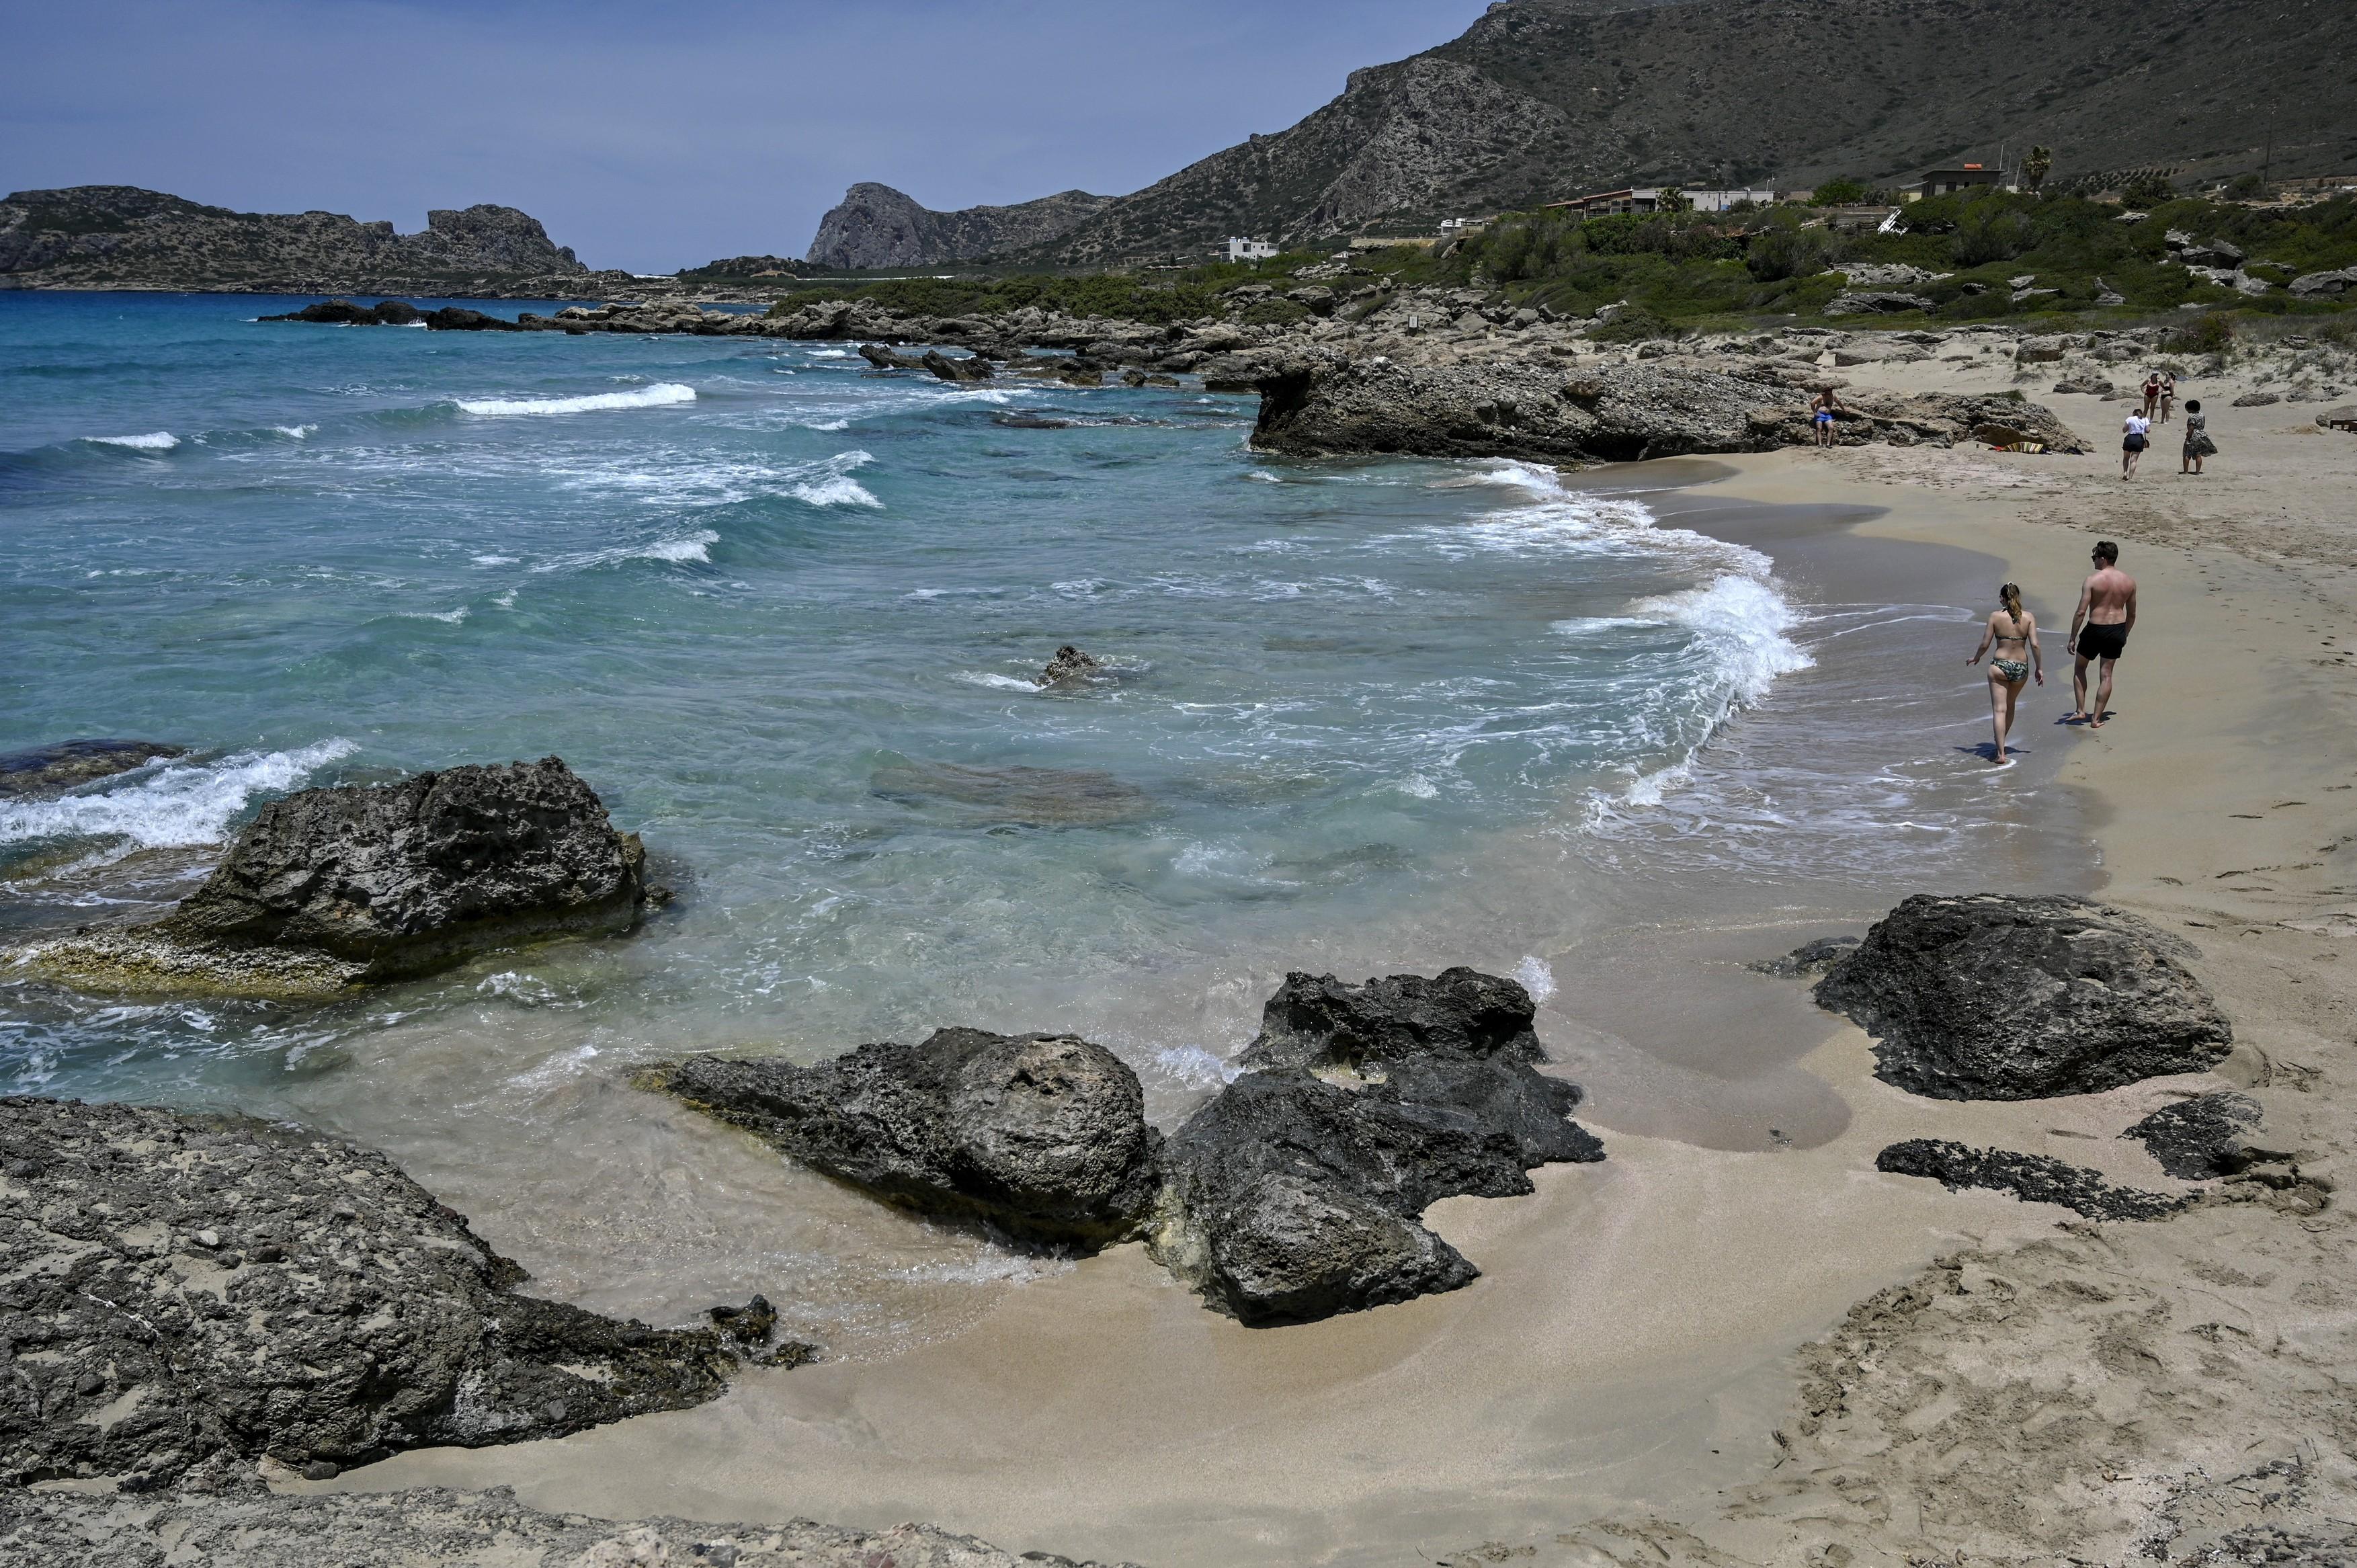 grecia plaja Falaserna Phalasarna creta 2profimedia